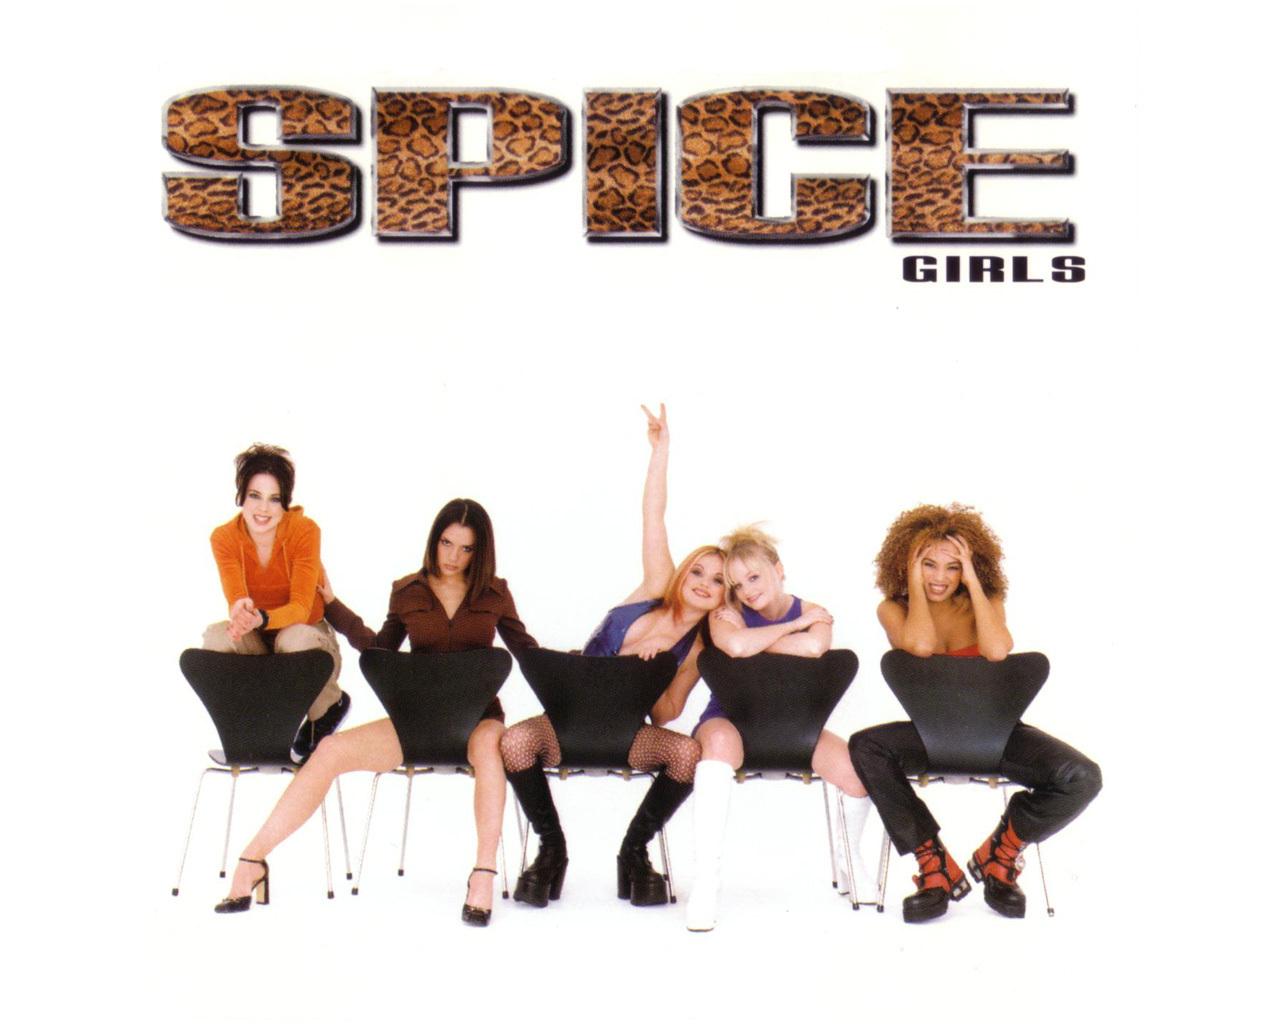 http://1.bp.blogspot.com/-LrquBlvFC7s/TyRYpR3x1dI/AAAAAAAABIg/GNpWjaVMbqs/s1600/Spice-Girls-spice-girls-1064263_1280_1024.jpg